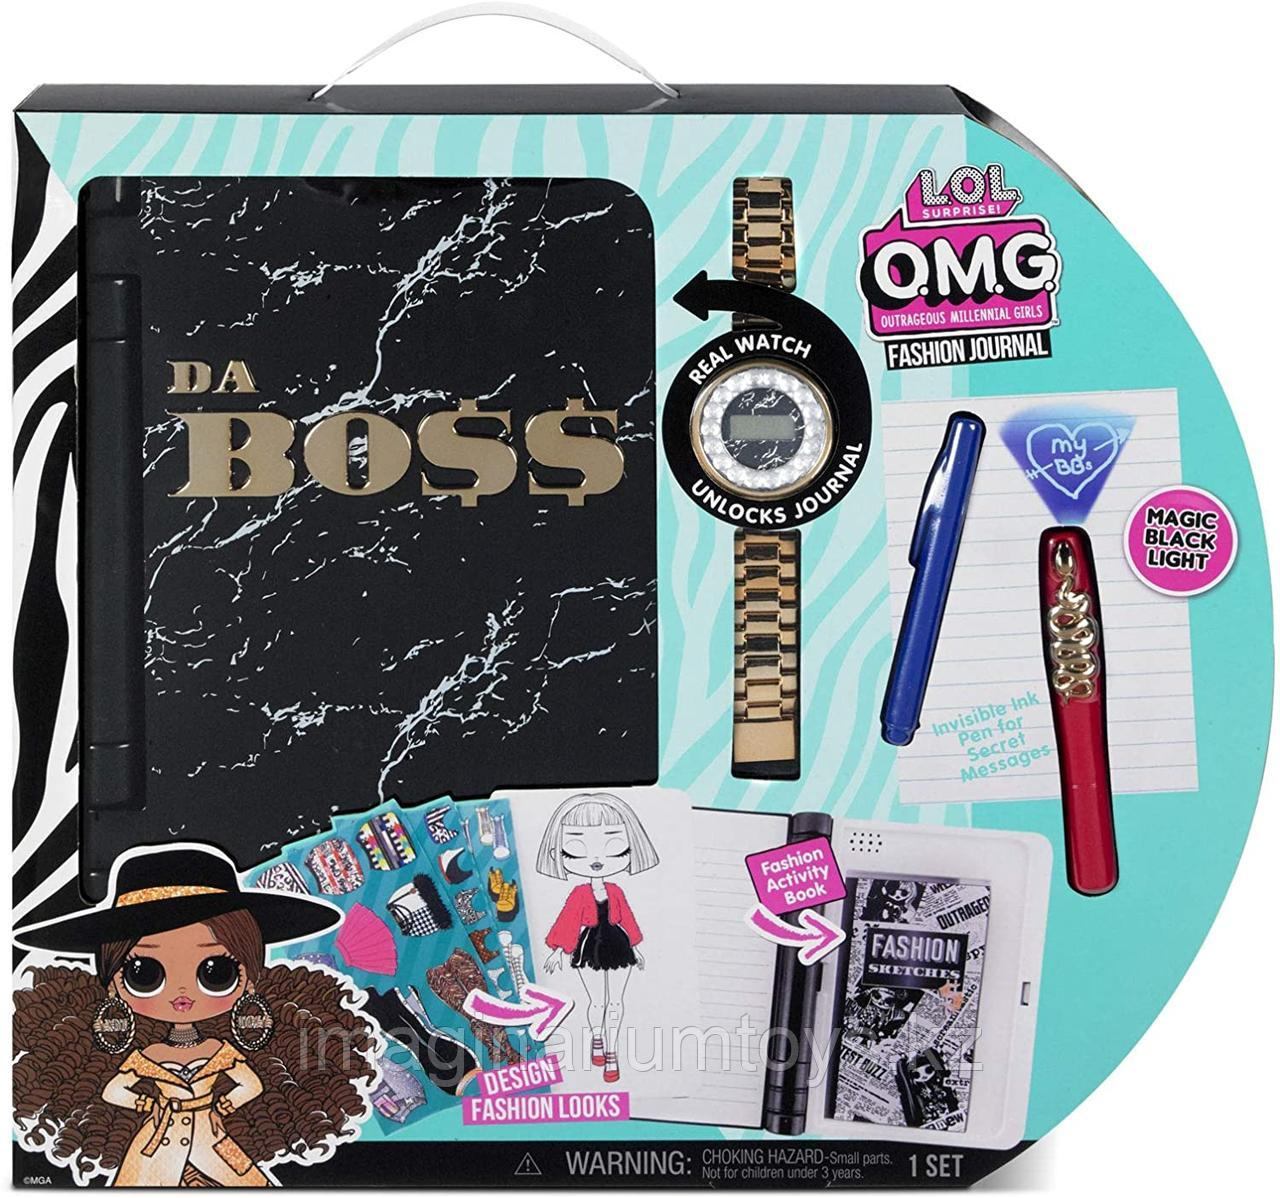 LOL Surprise OMG Fashion Journal Модный журнал ЛОЛ Да Босс - фото 1